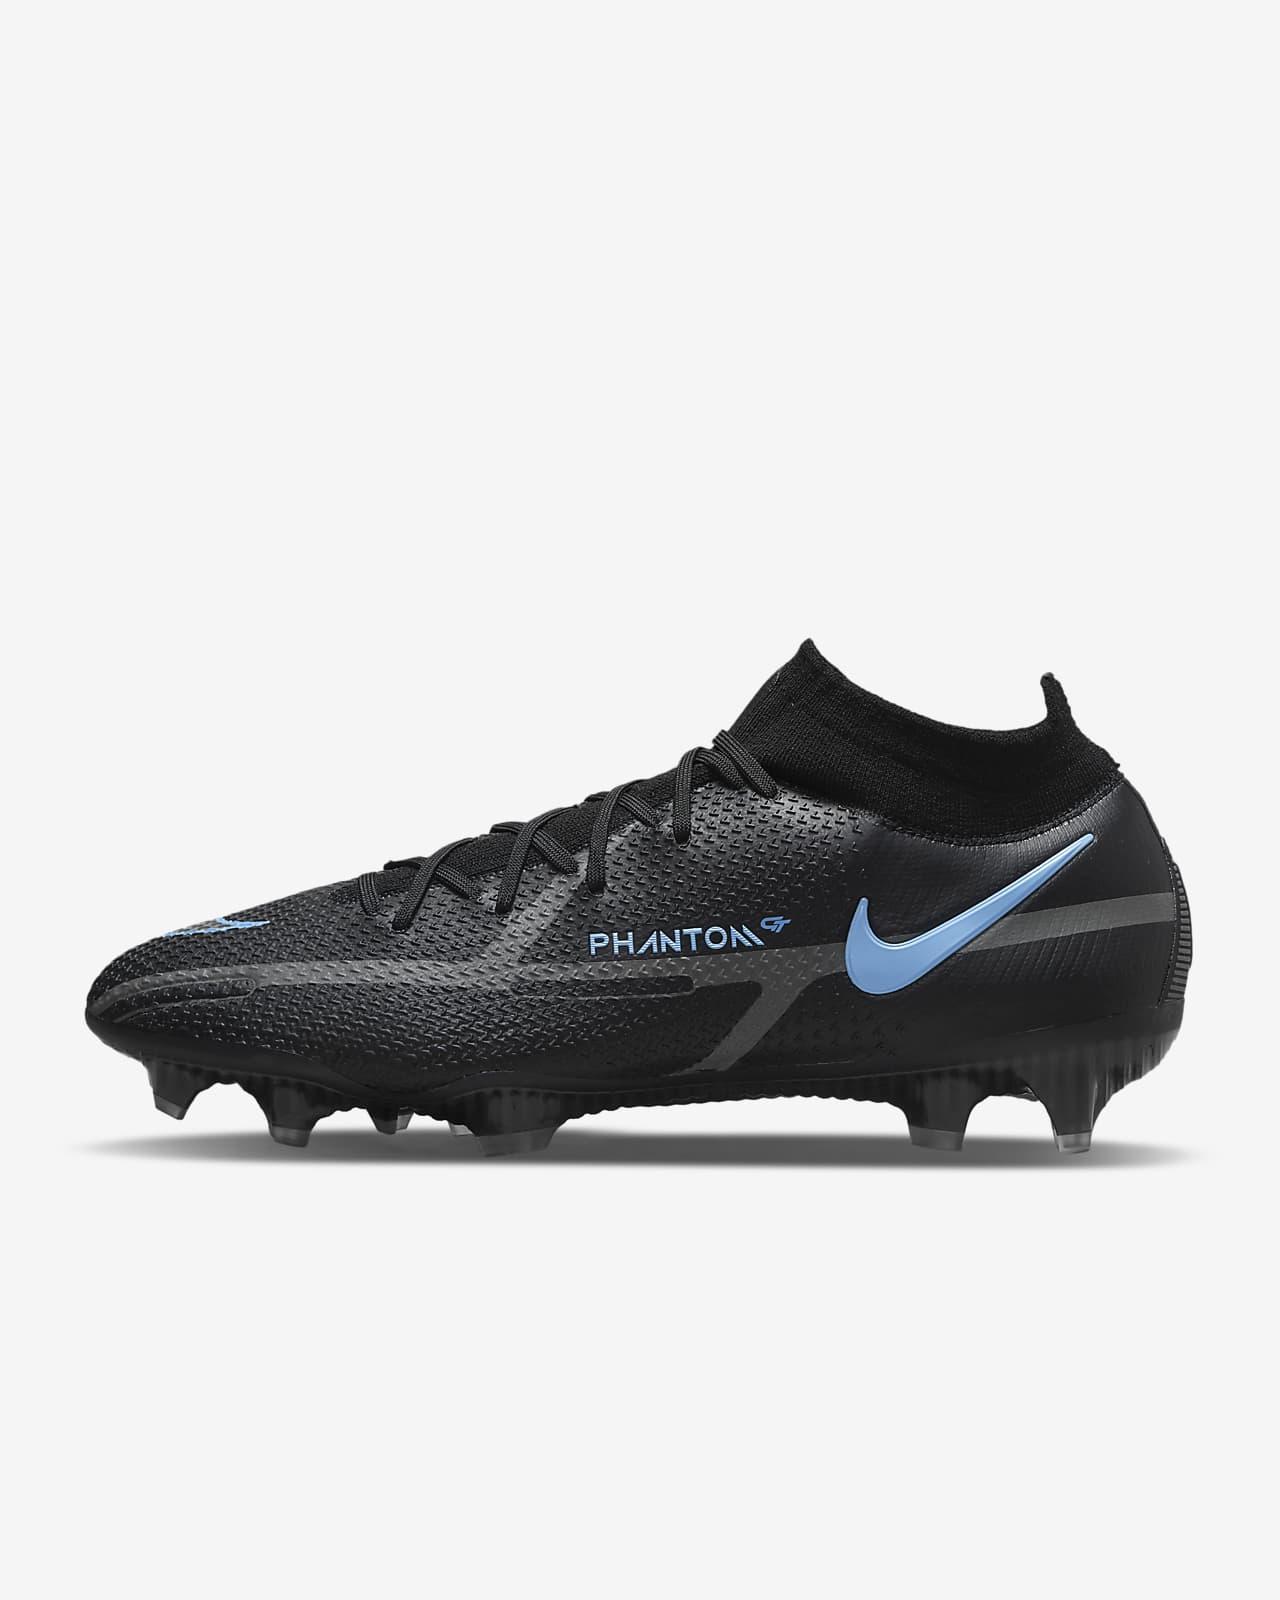 Calzado de fútbol para terreno firme Nike Phantom GT2 Dynamic Fit Elite FG